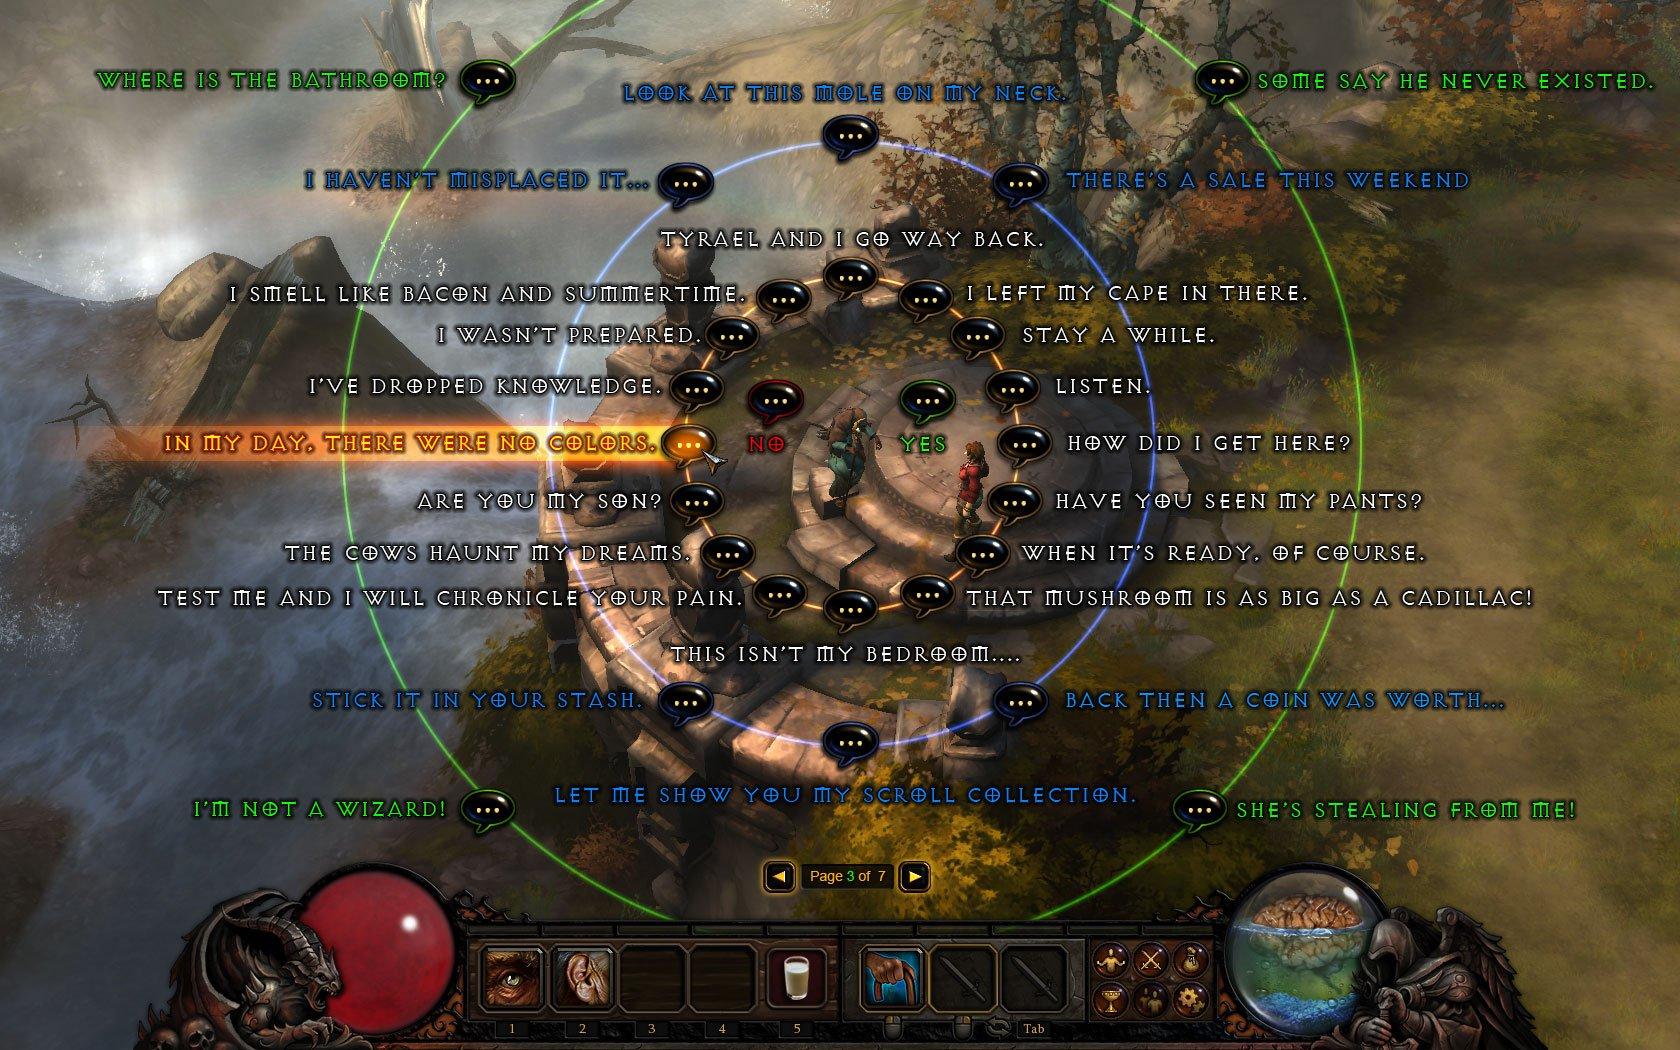 New Diablo III Class Revealed: The Archivist #6907